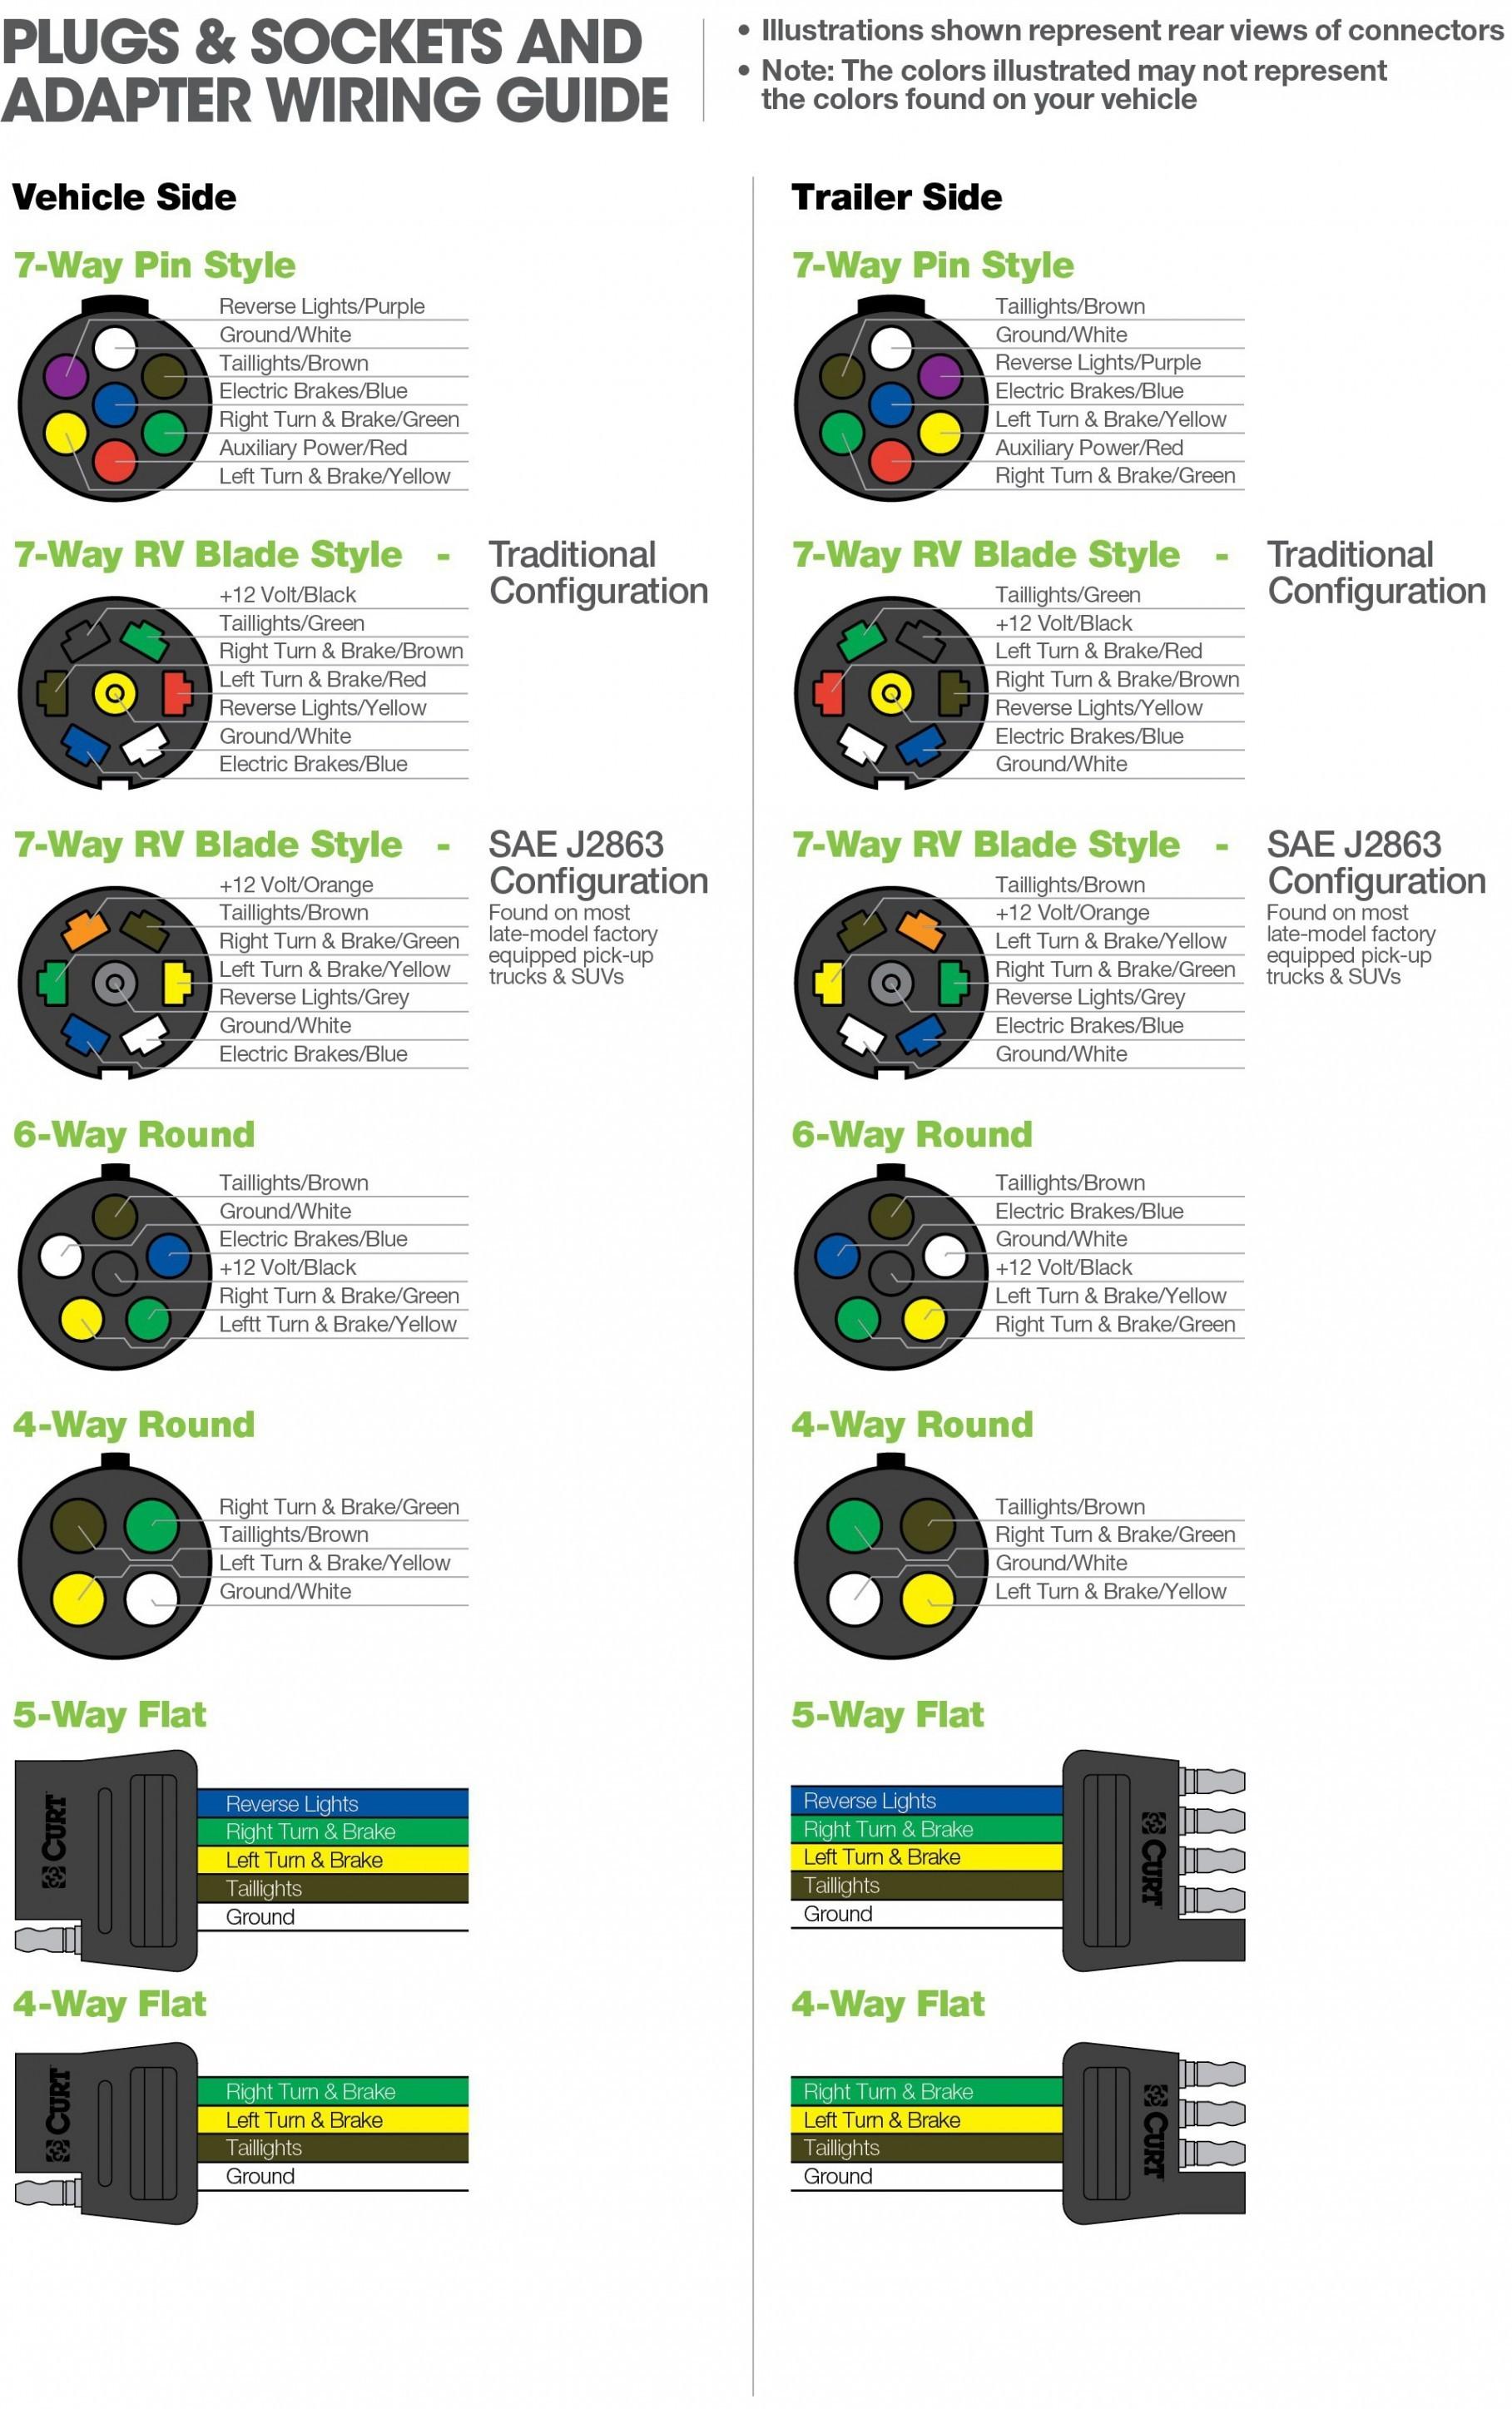 5 pin trailer wiring color diagram bn 1329  pin trailer plug wiring diagram on 5 wire trailer wiring  pin trailer plug wiring diagram on 5